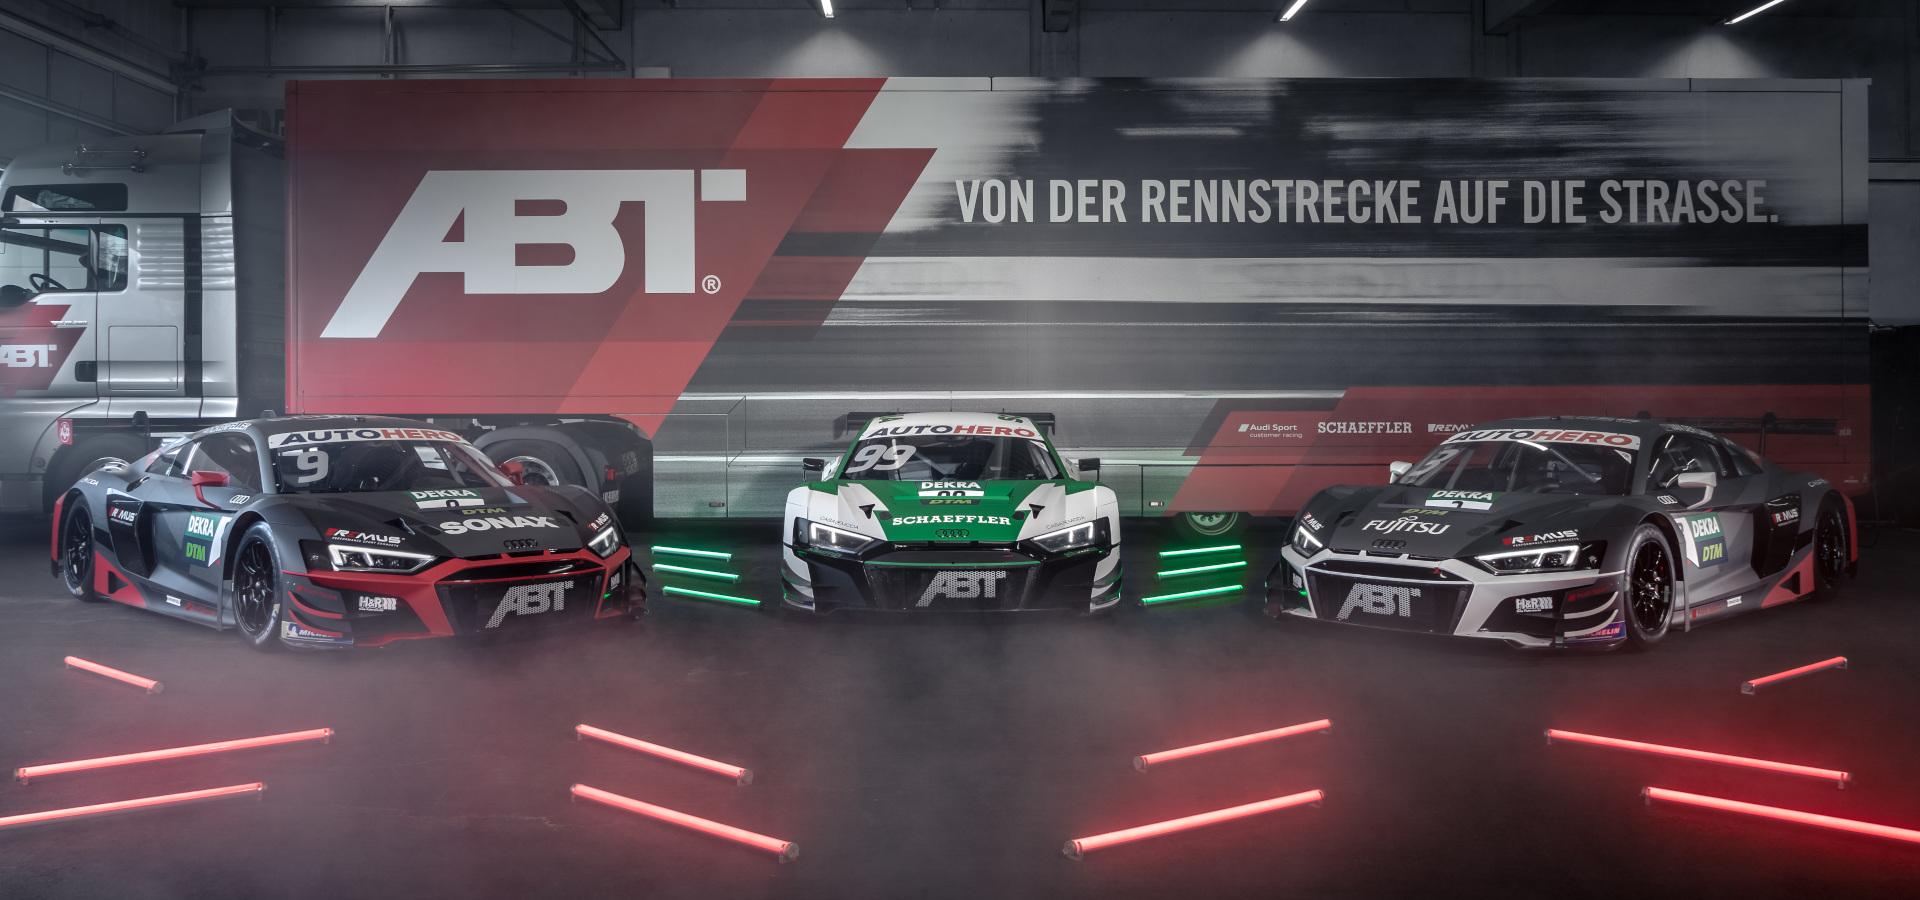 DTM - Audi Tuning, VW Tuning, Chiptuning von ABT Sportsline.